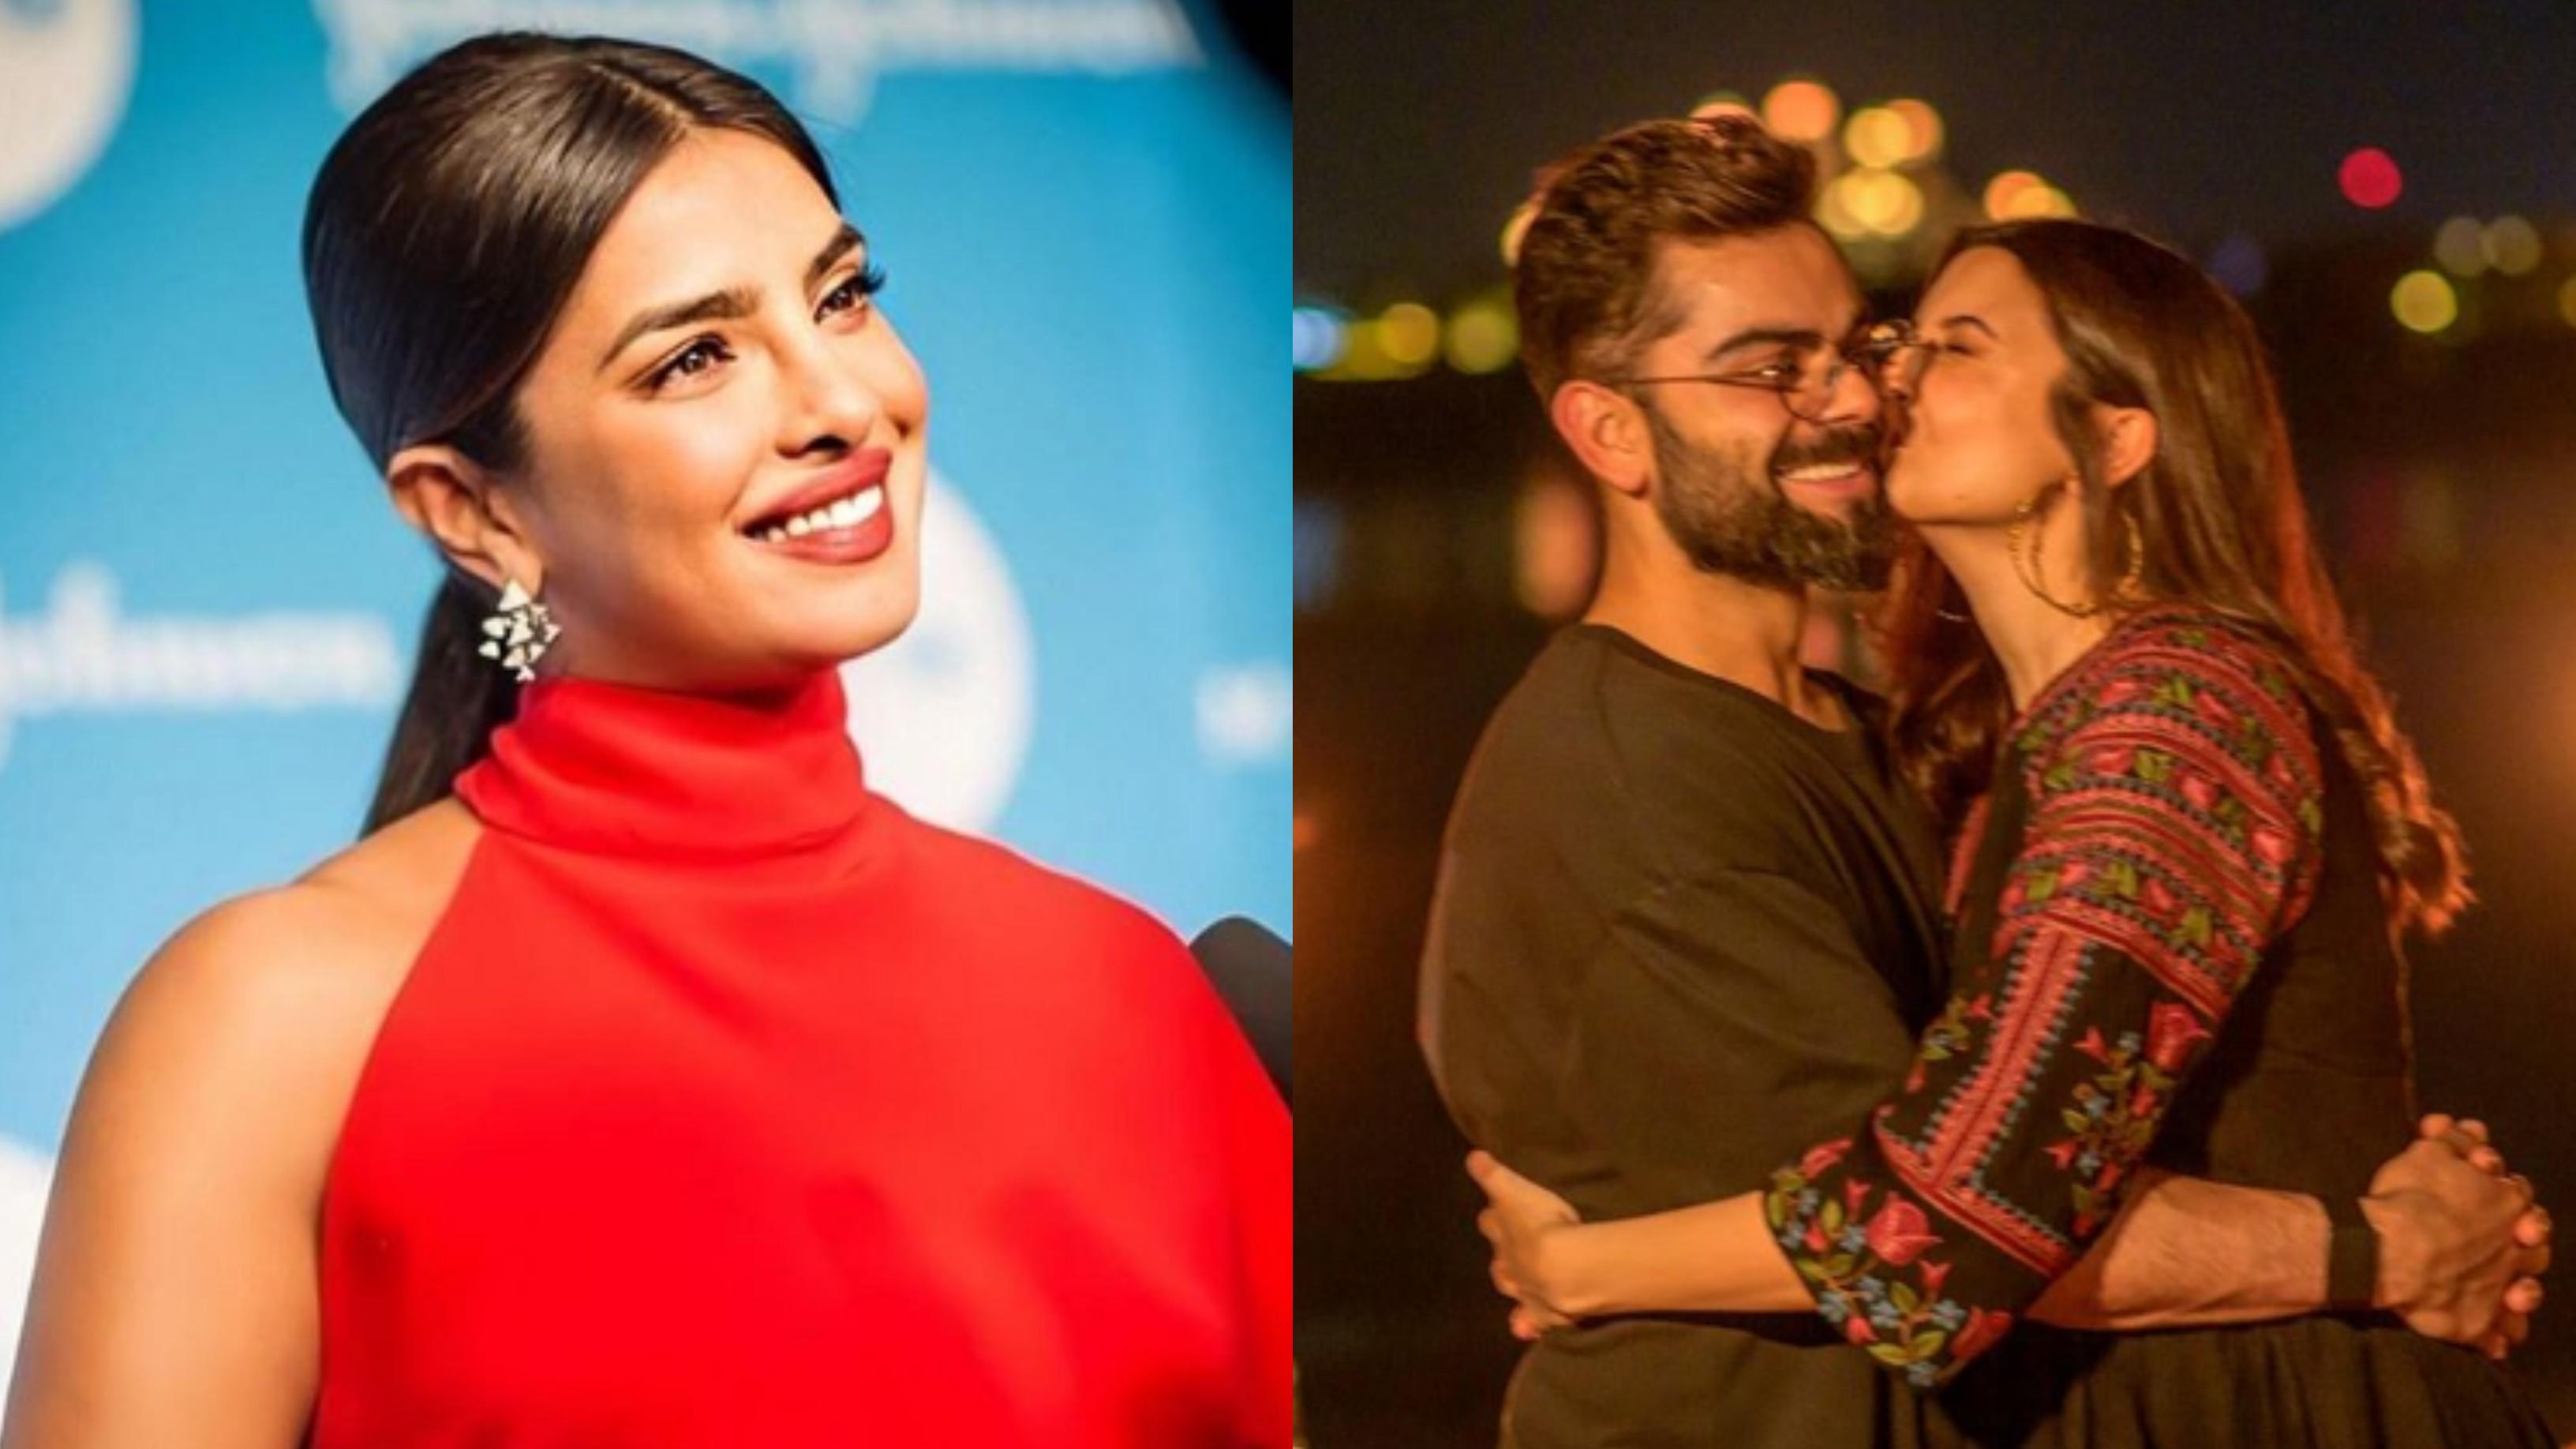 Anushka Sharma showers Virat Kohli with love and kisses in latest Instagram post; Priyanka Chopra reacts